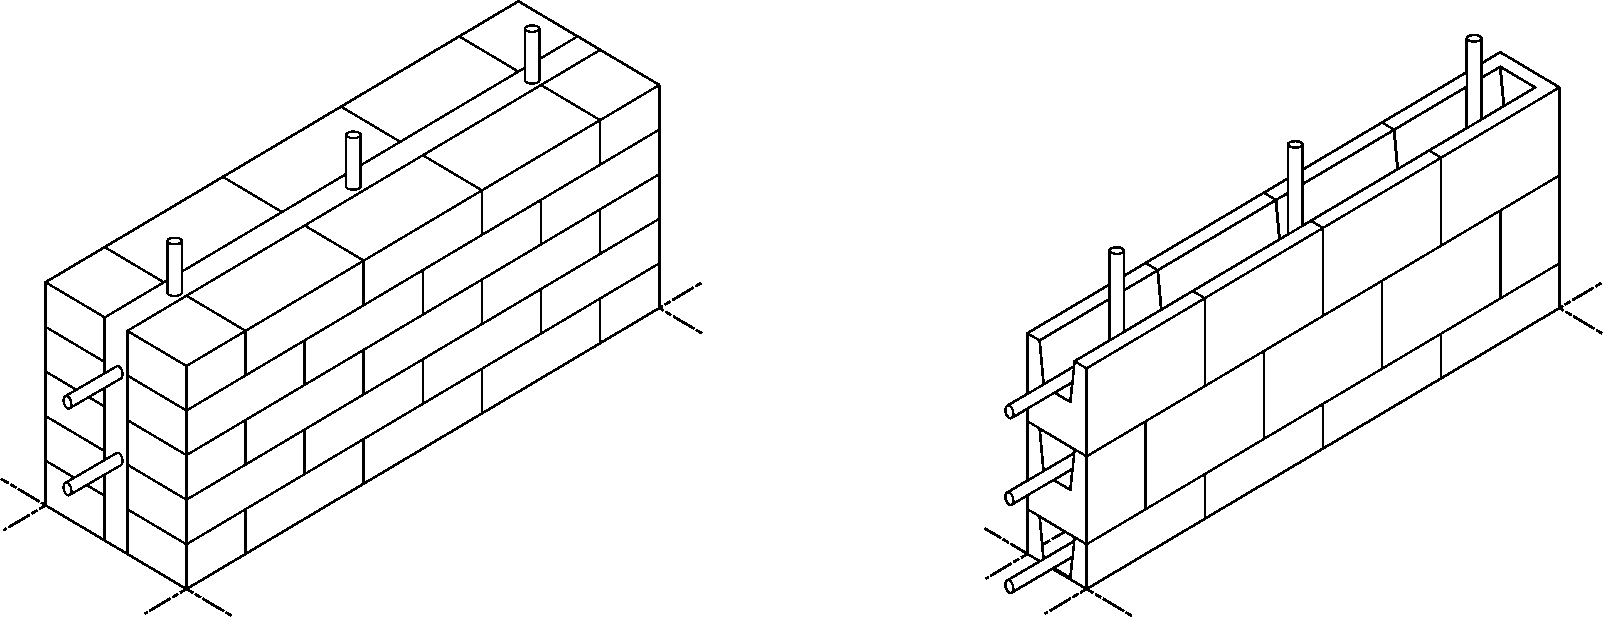 Reinforced Brick Wall Design : Chiarc  eq safe design